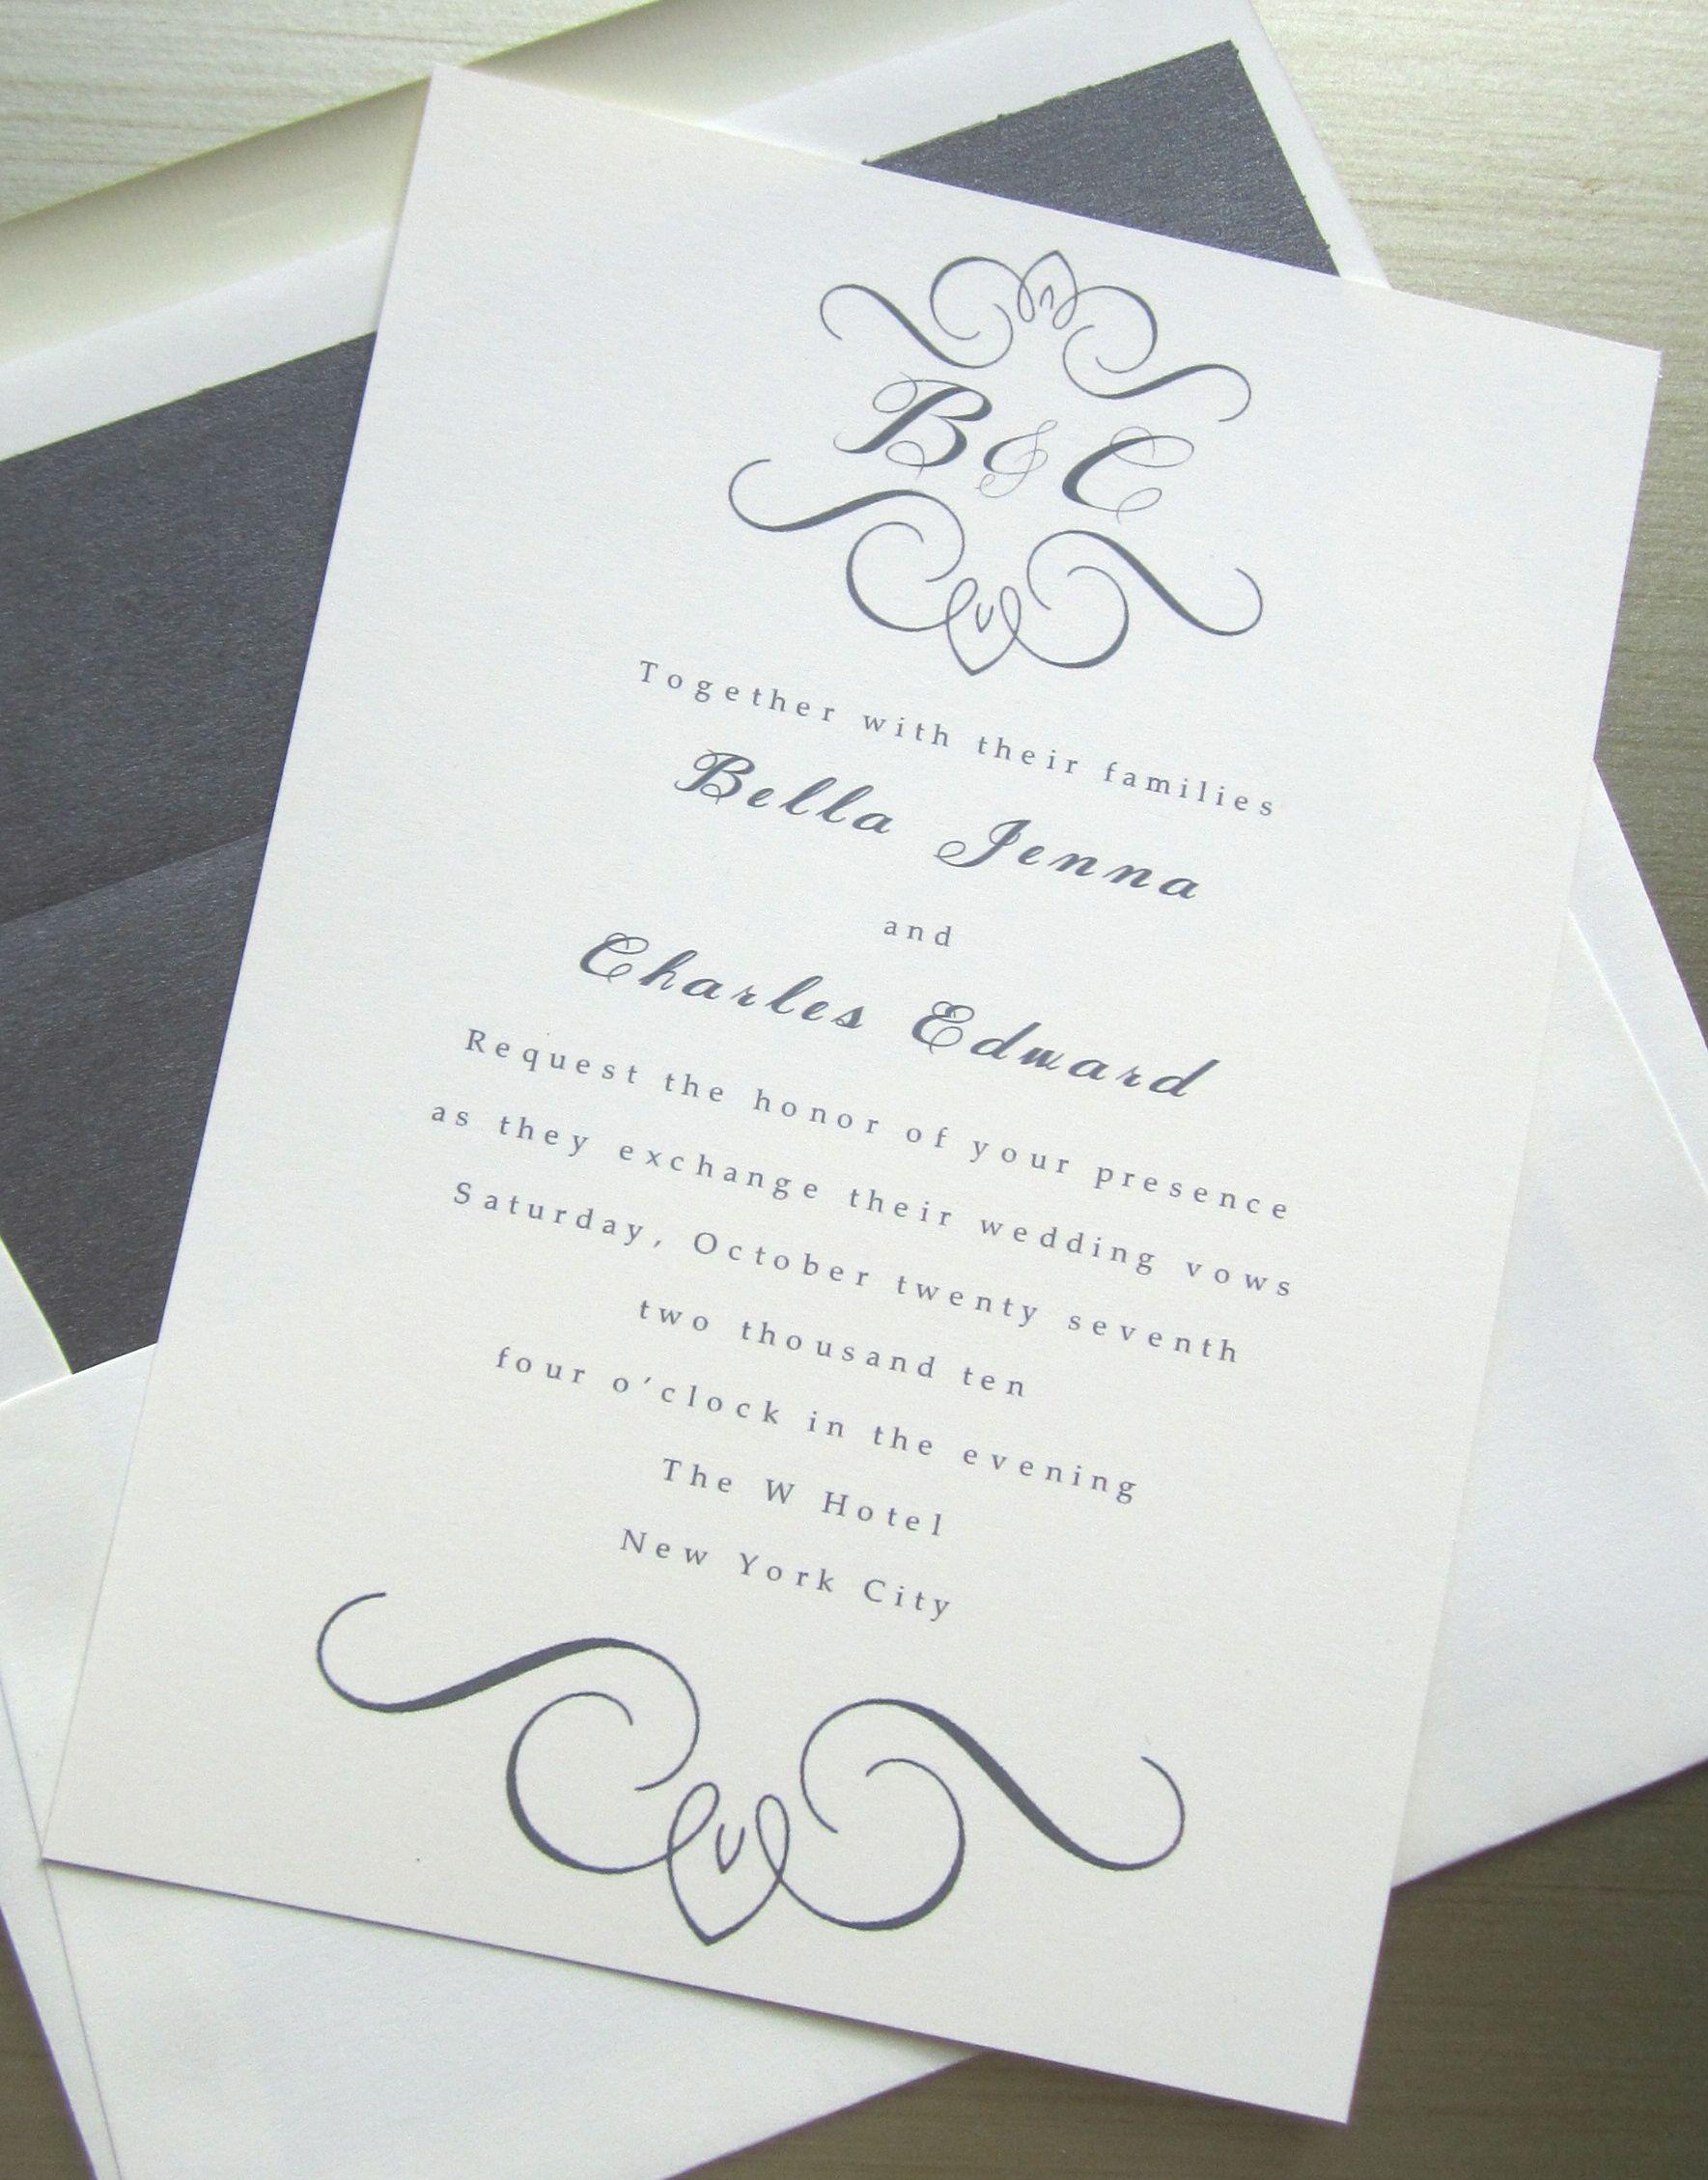 Pin by Anna on wedding | Pinterest | Wedding